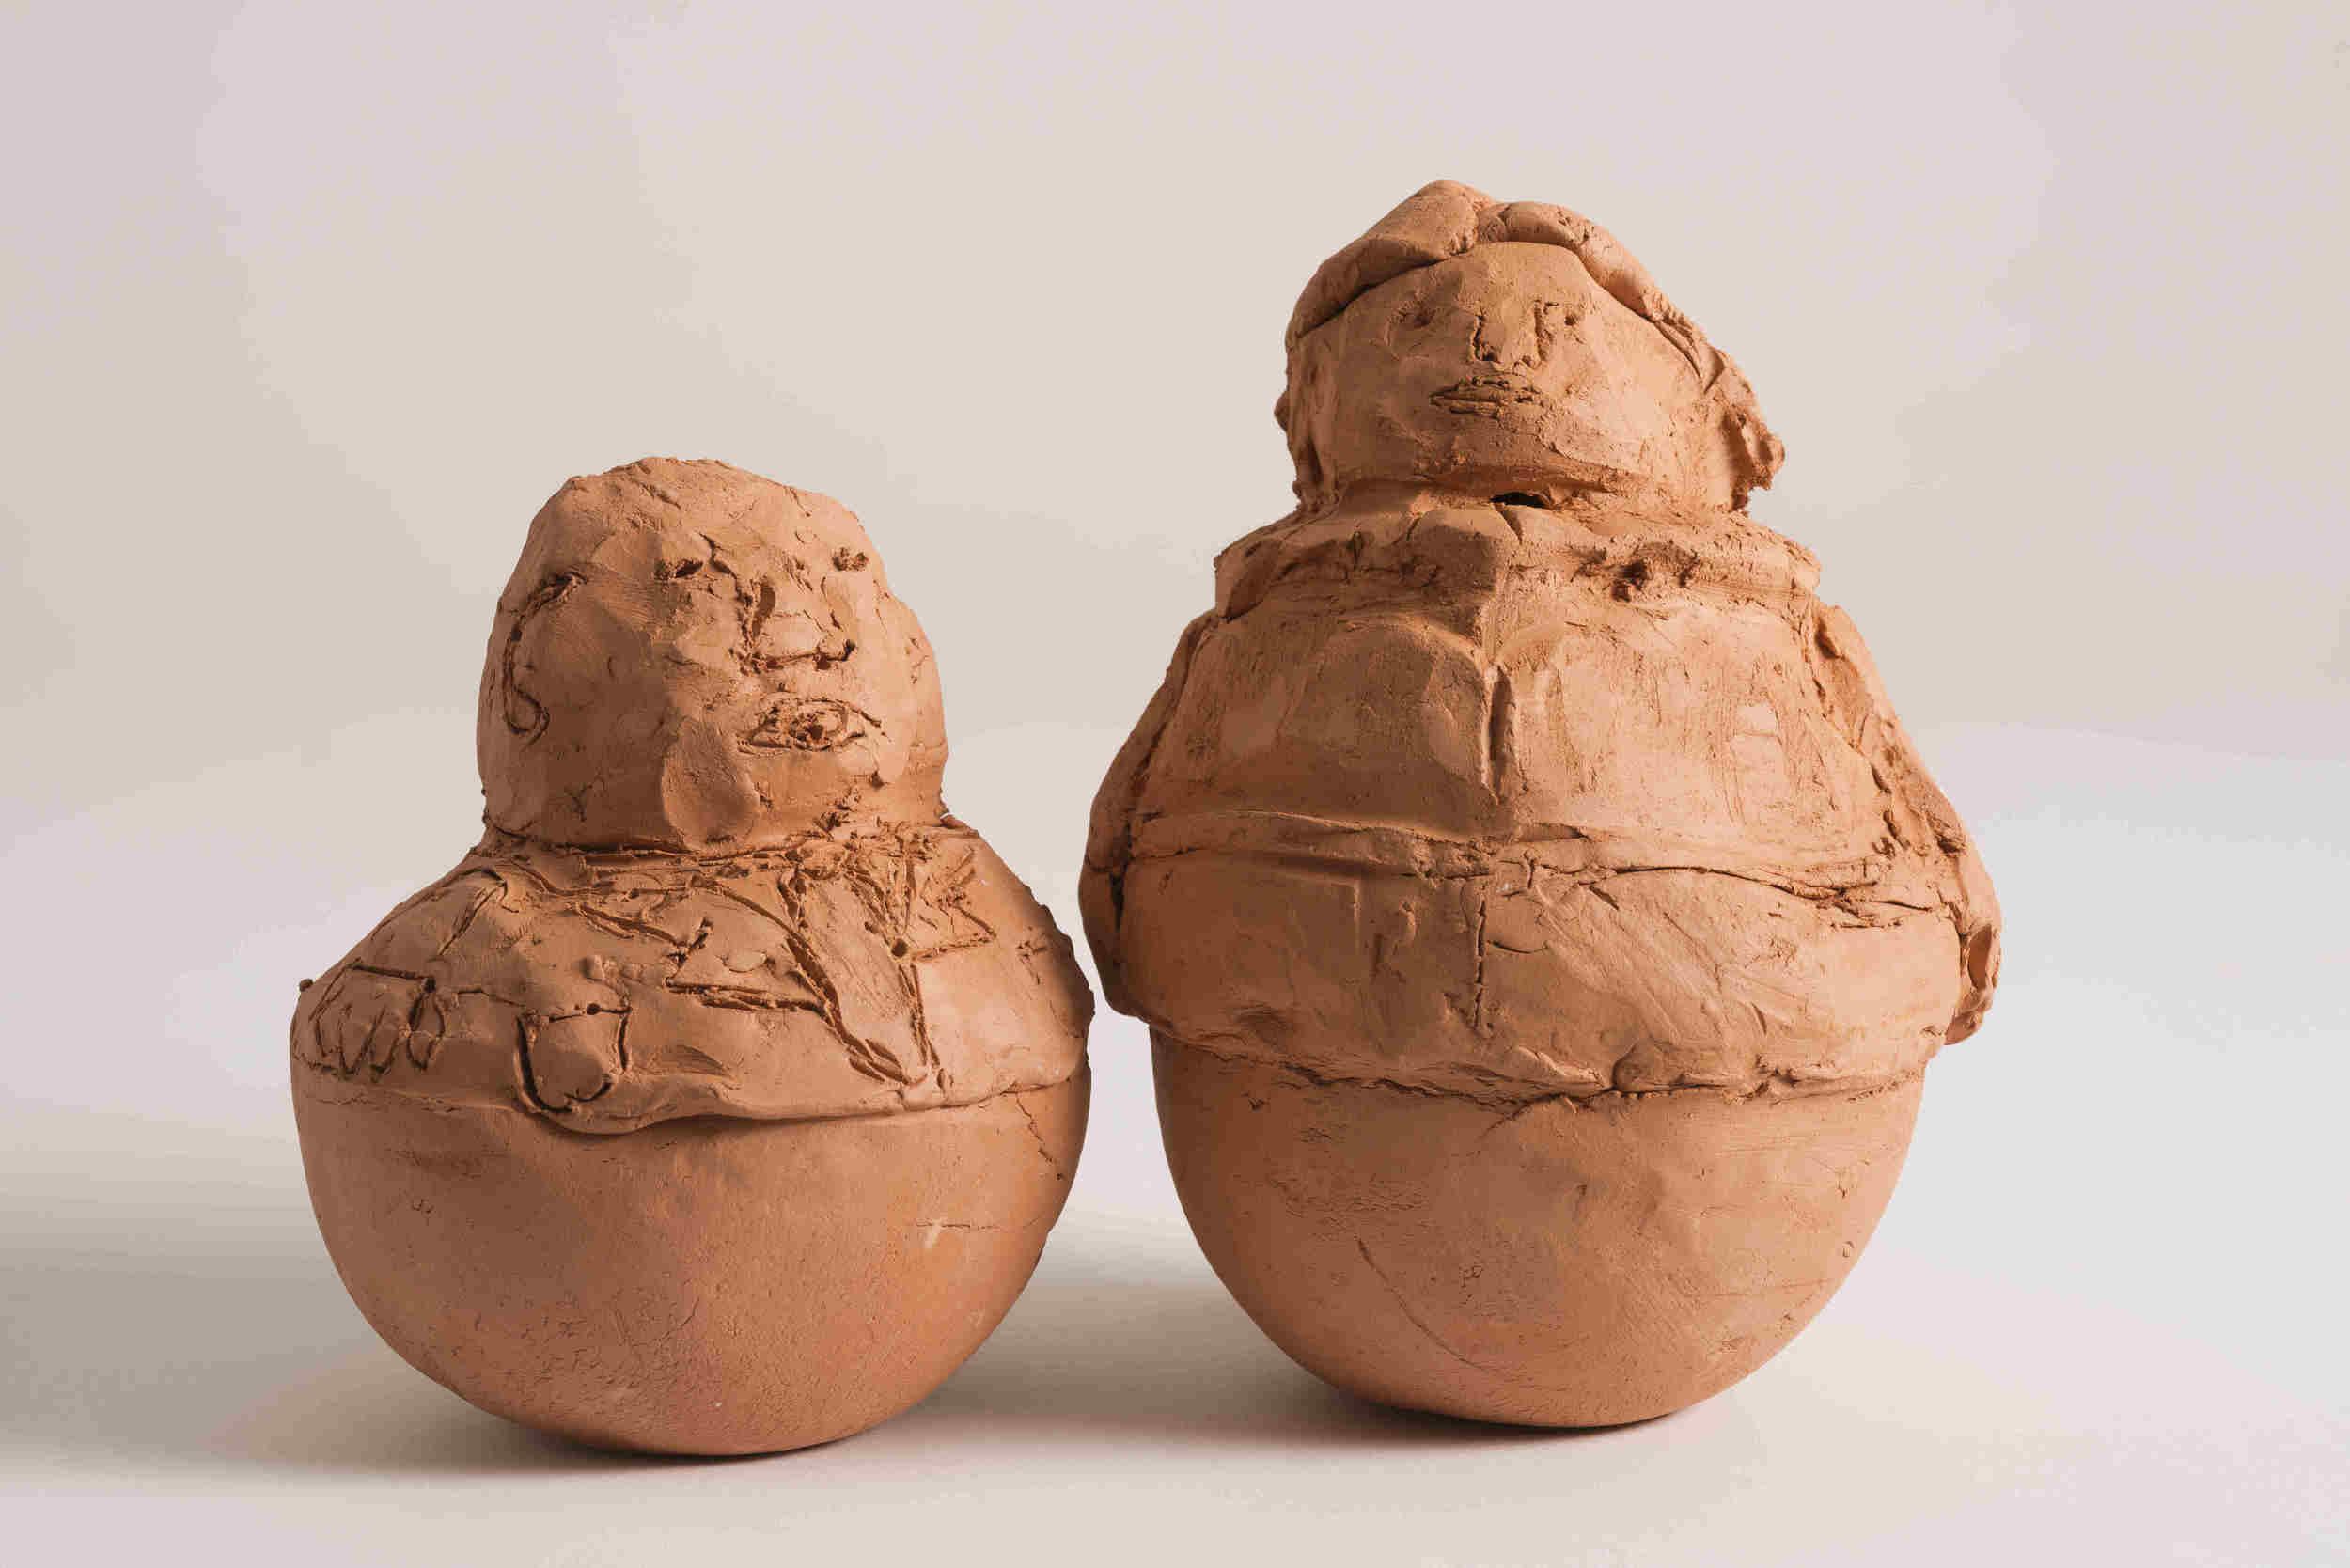 """Pushovers Unite (A Quiet Revolution)"", Detail #2, 2015, 2 Red Earthenware Ceramic Sculptures, Each approximately 7""x5"""